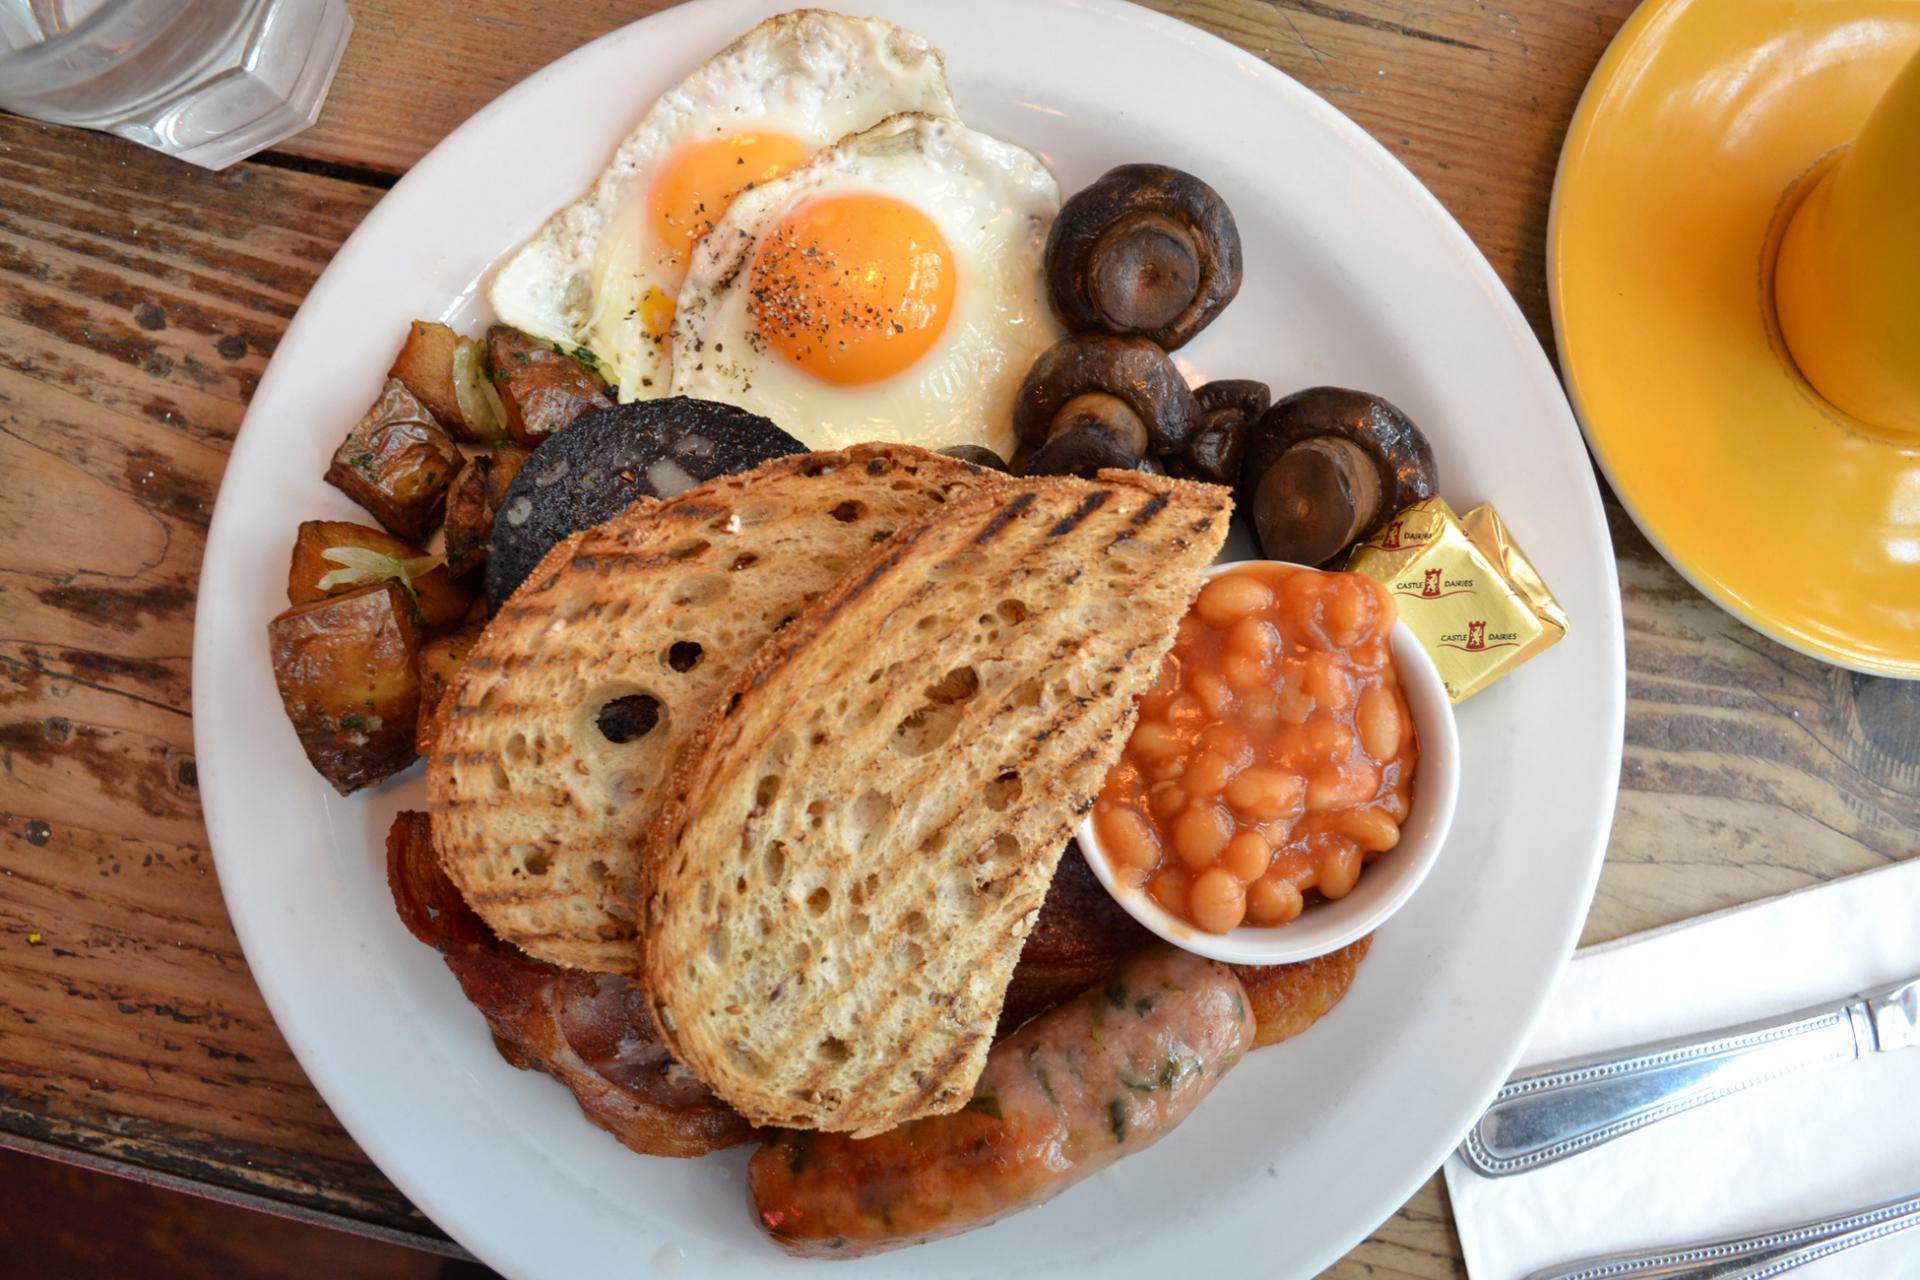 Desayuno ingles en Londres: The Breakfast Club